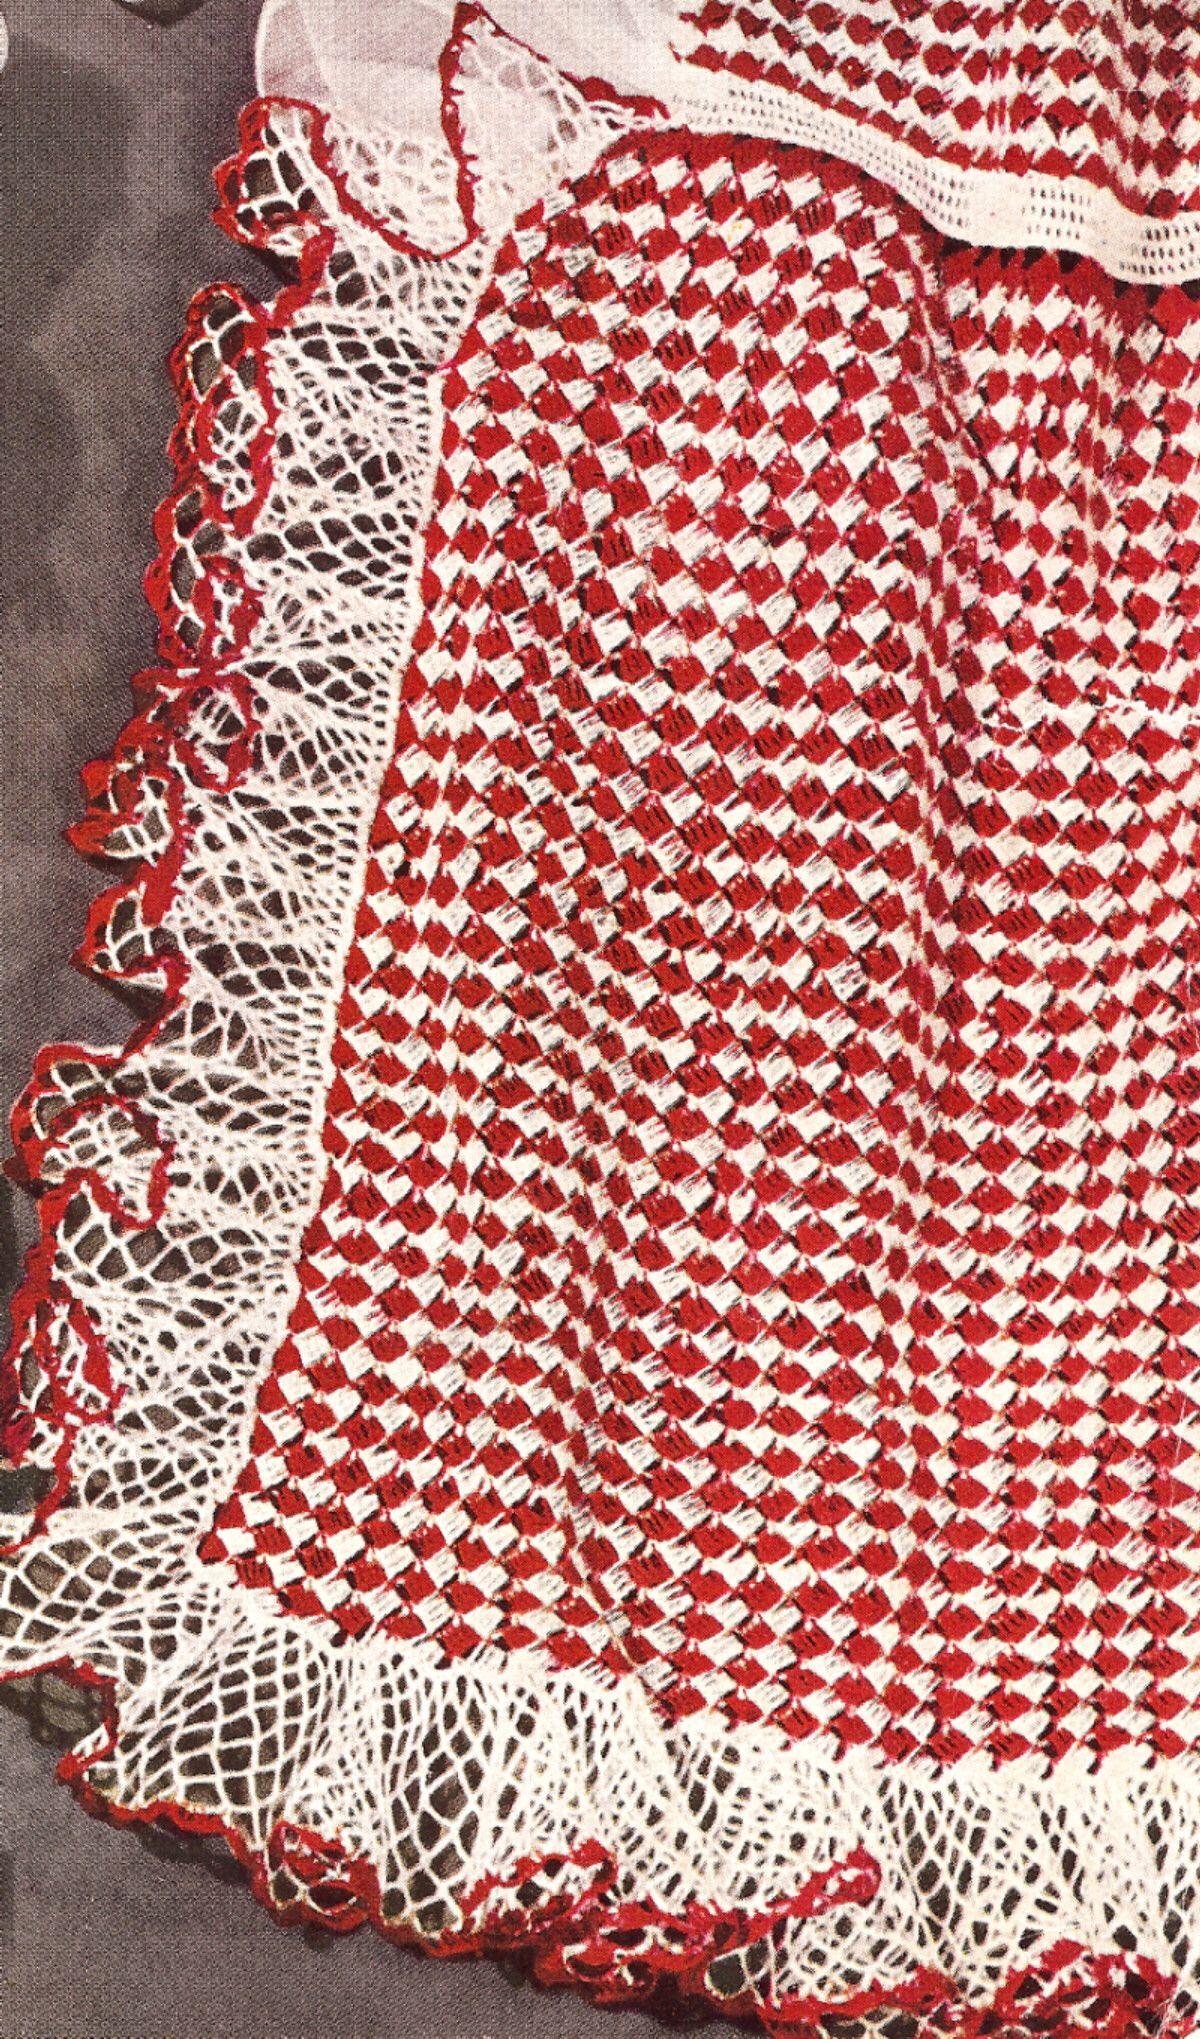 Vintage Ruffled Tea Apron Crochet Pattern | Aprons | Pinterest